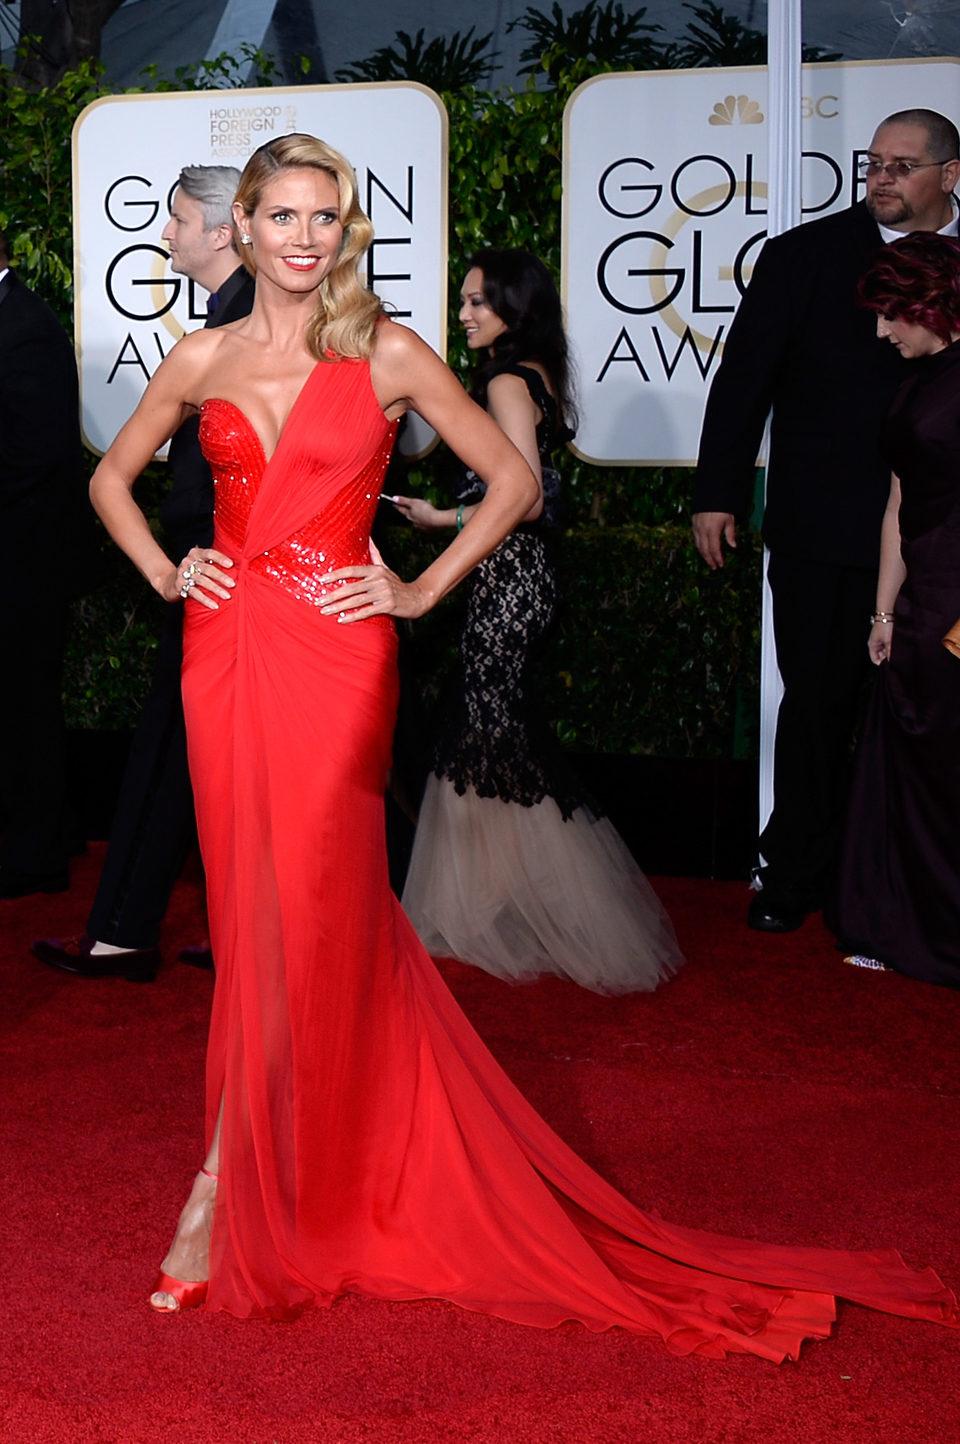 Heidi Klum at the Golden Globes 2015 red carpet